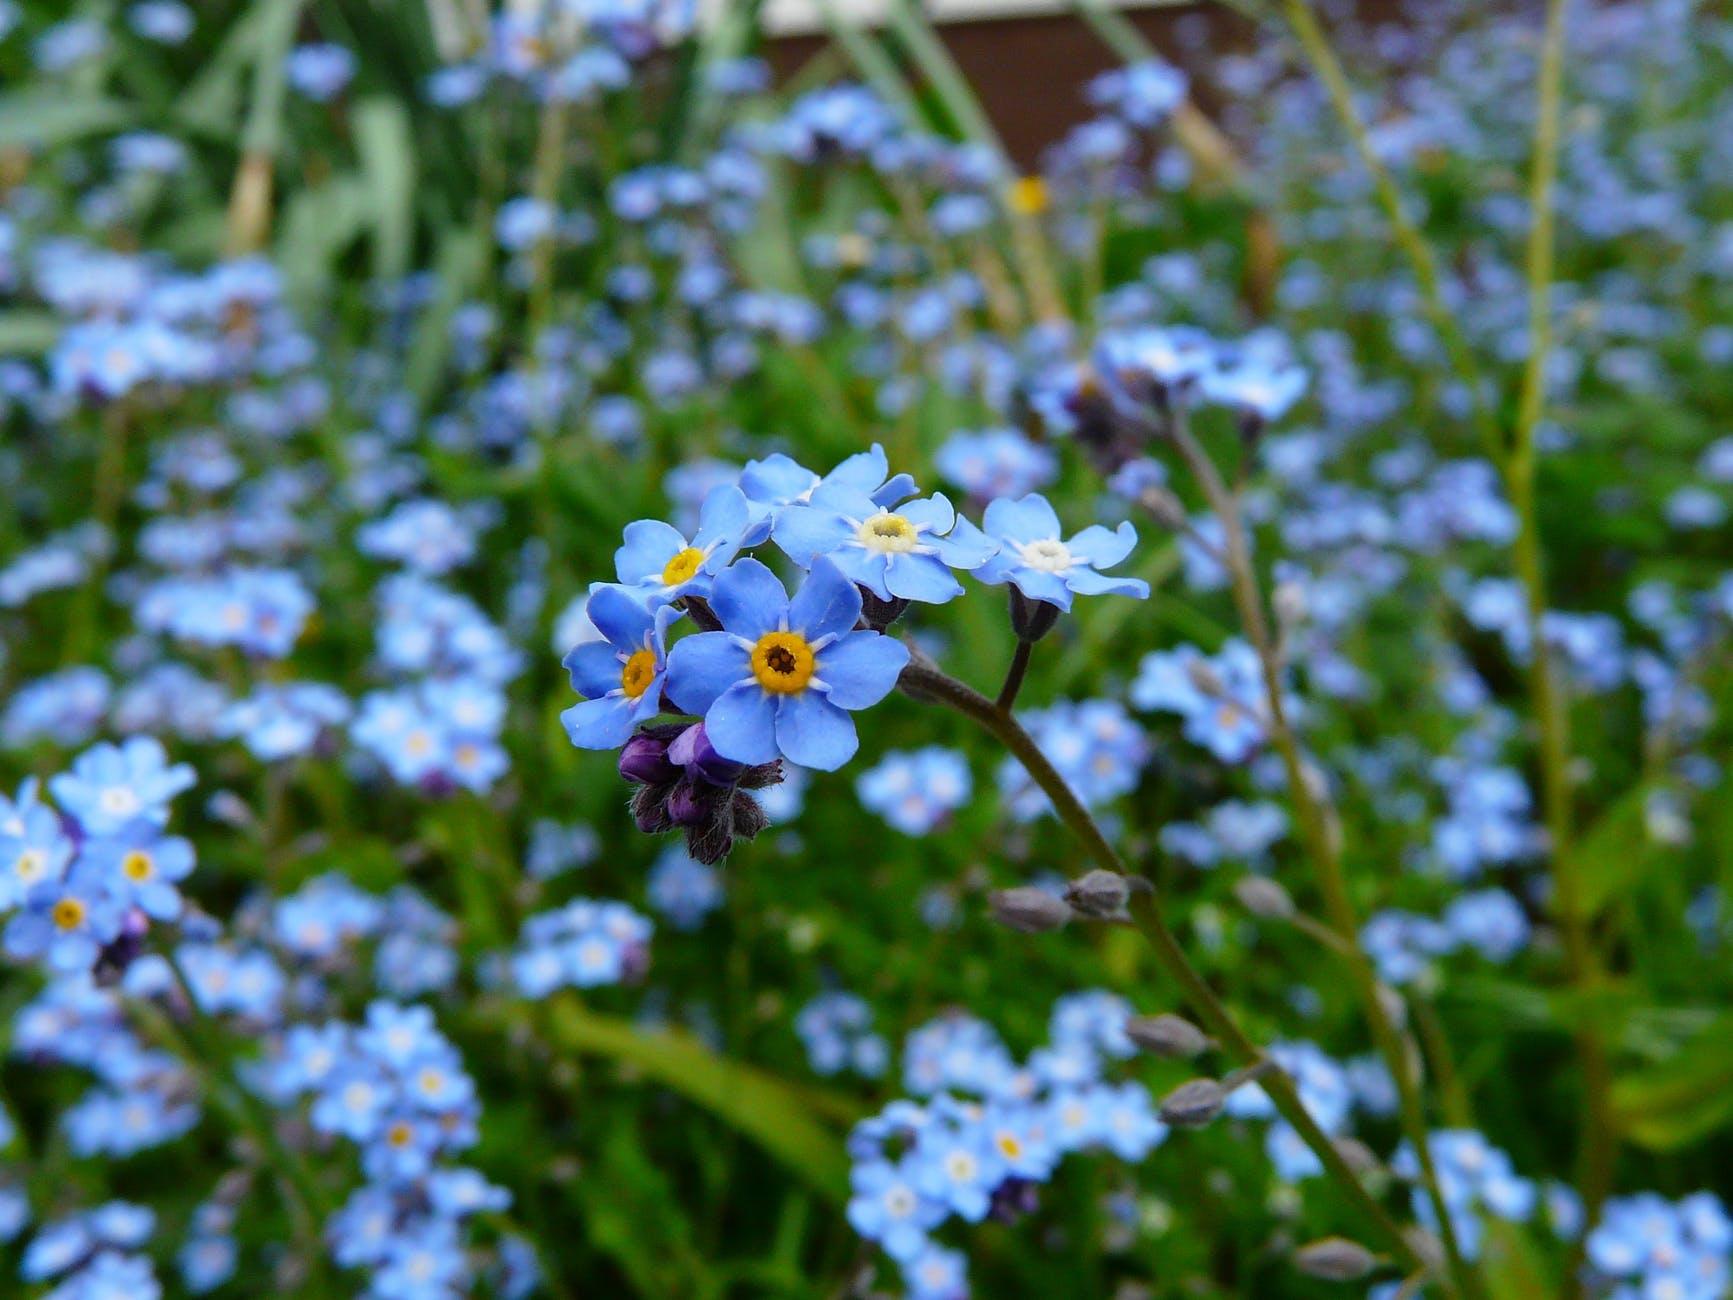 forget-me-not-flower-meadow-wild-flower-60005.jpeg